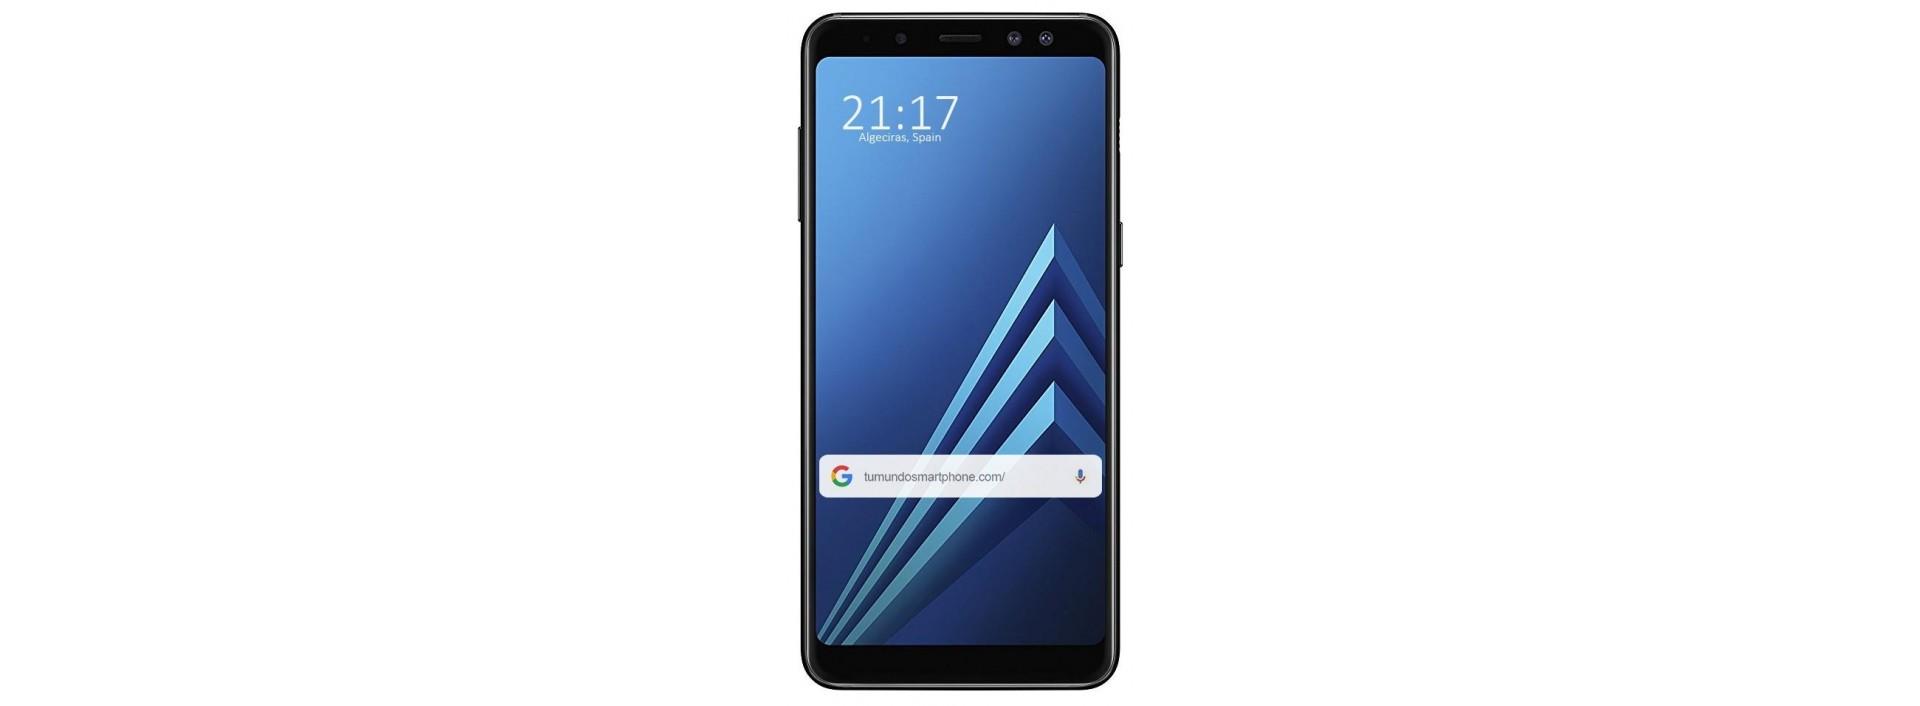 Funda para Galaxy A8 (2018)